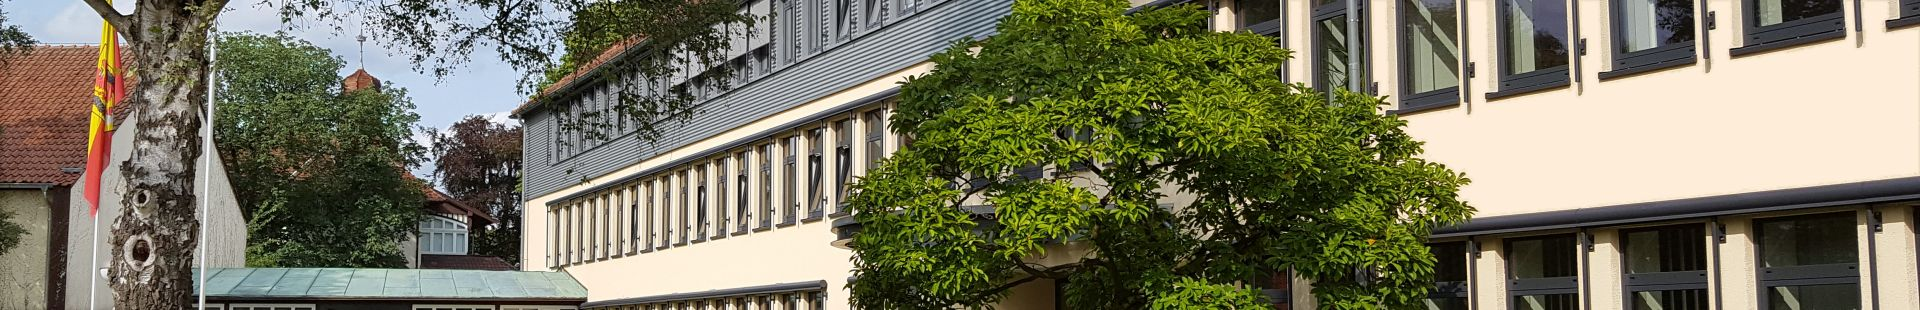 Kreishaus in Diepholz (Haupteingang in der Niedersachsenstraße)